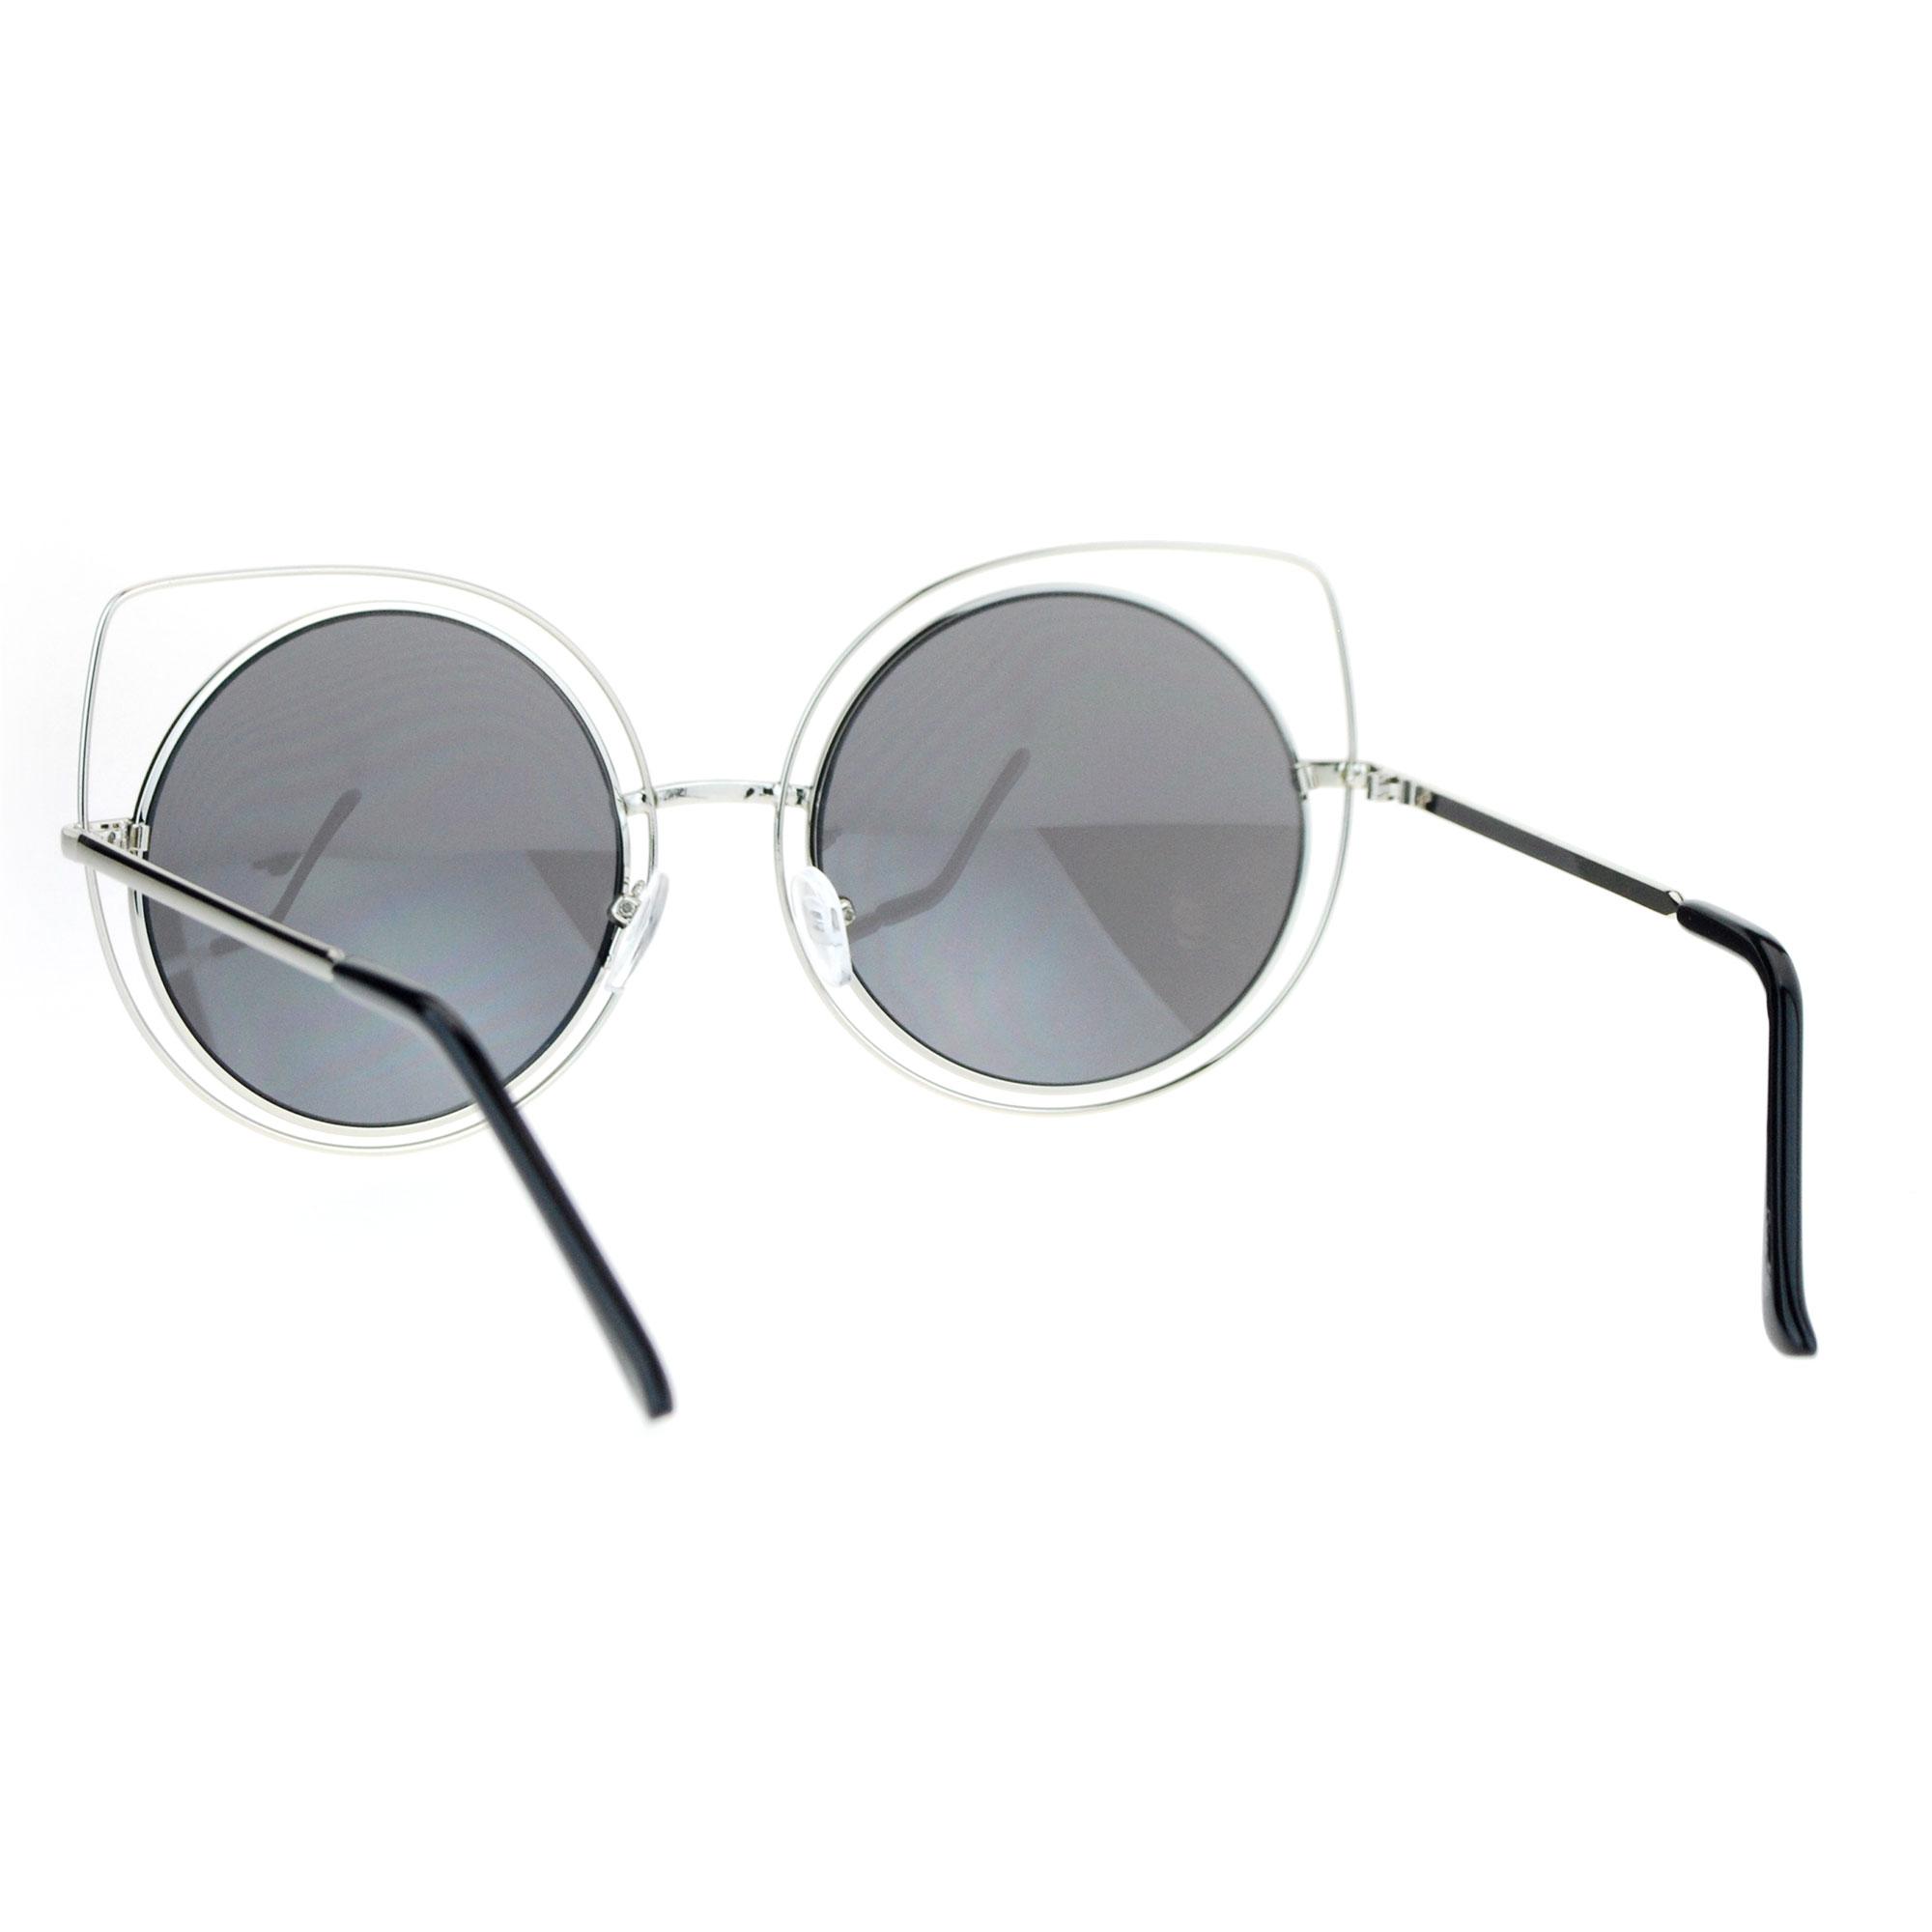 Circle Lens Sunglasses  sa106 womens wire rim bat shape cat eye round circle lens